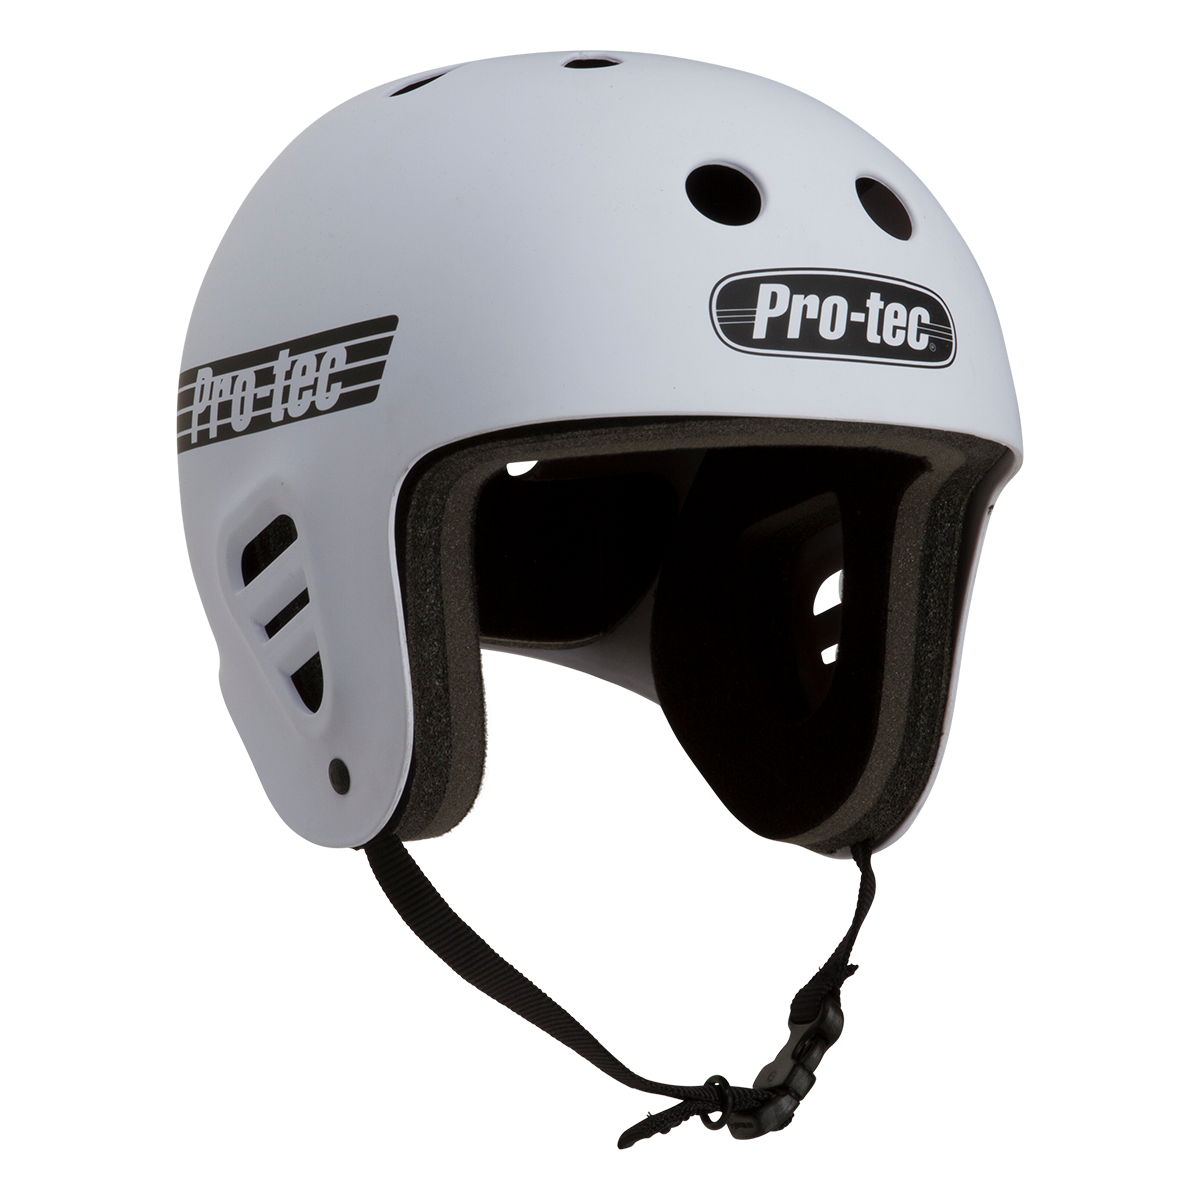 Pro-Tec Pro-tec Fullcut (Certified) Matte White Helmet XSmall